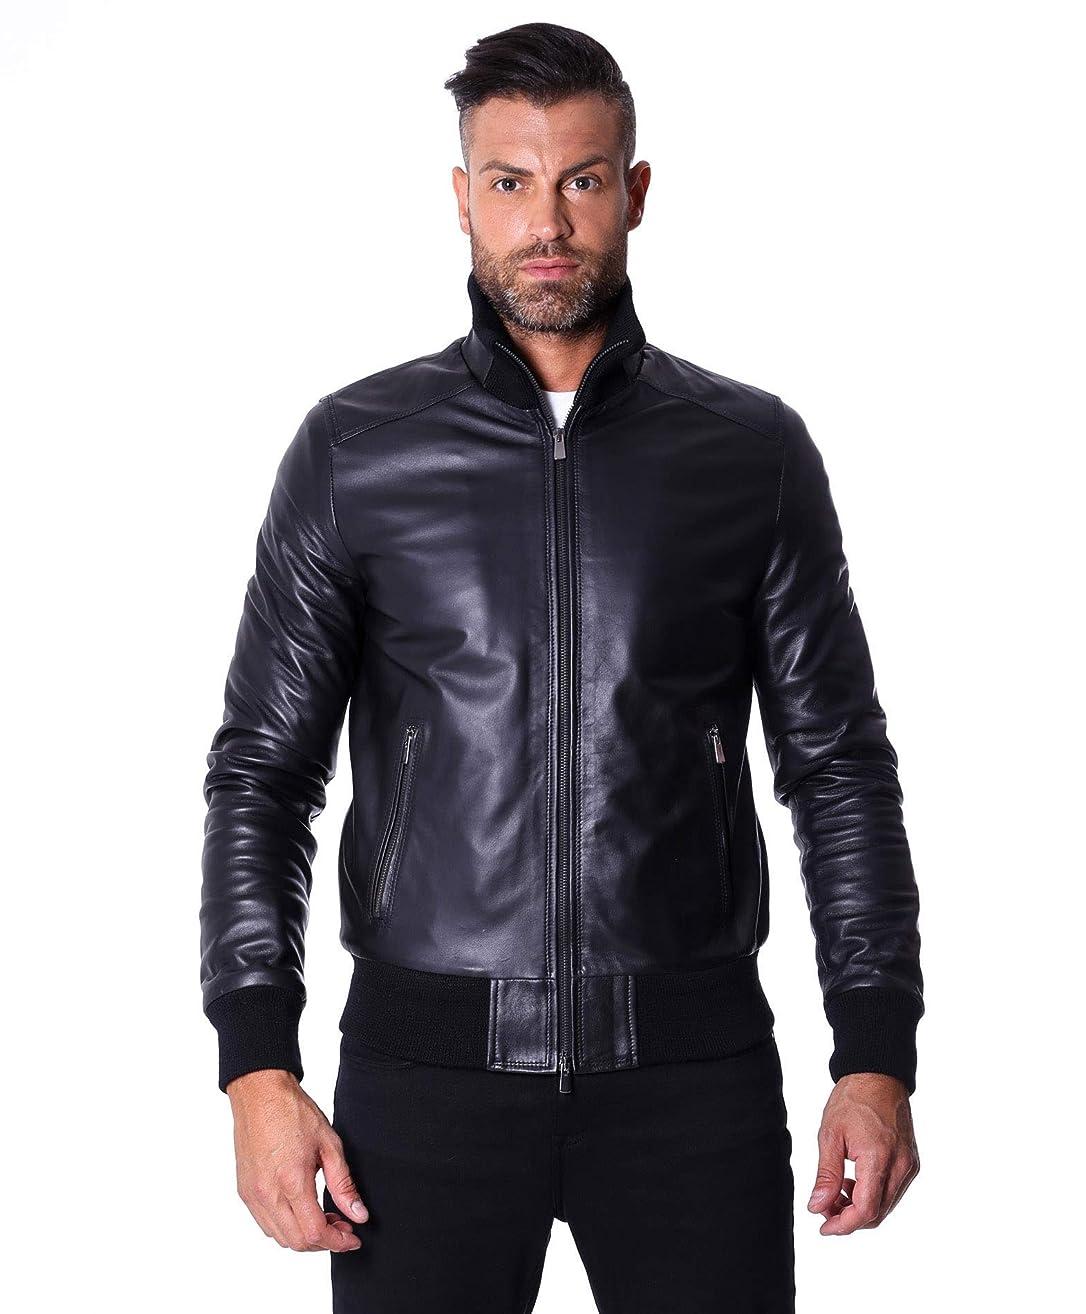 Men's Italian Leather Bomber Jacket Black